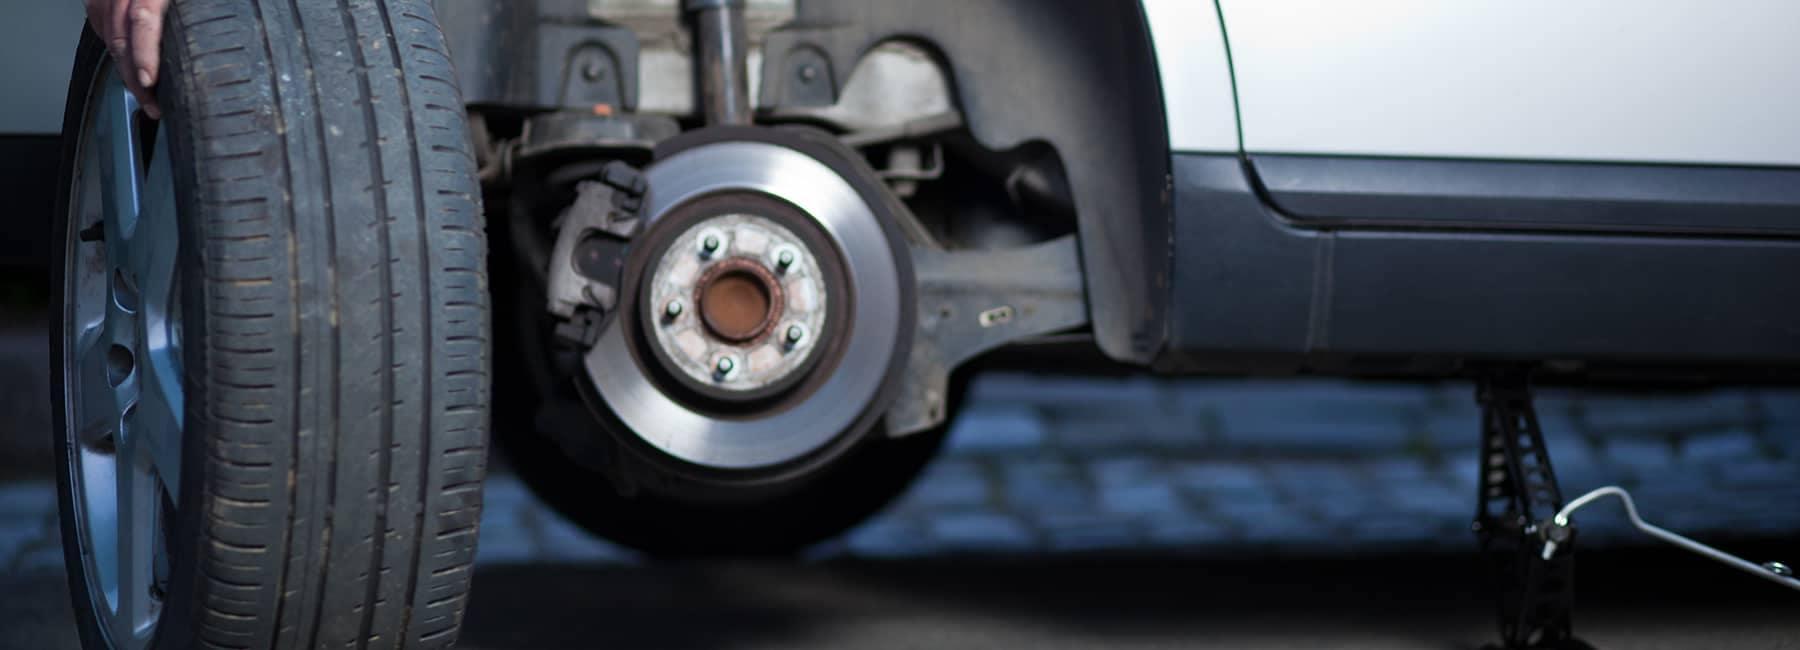 removing tire to repair car brakes